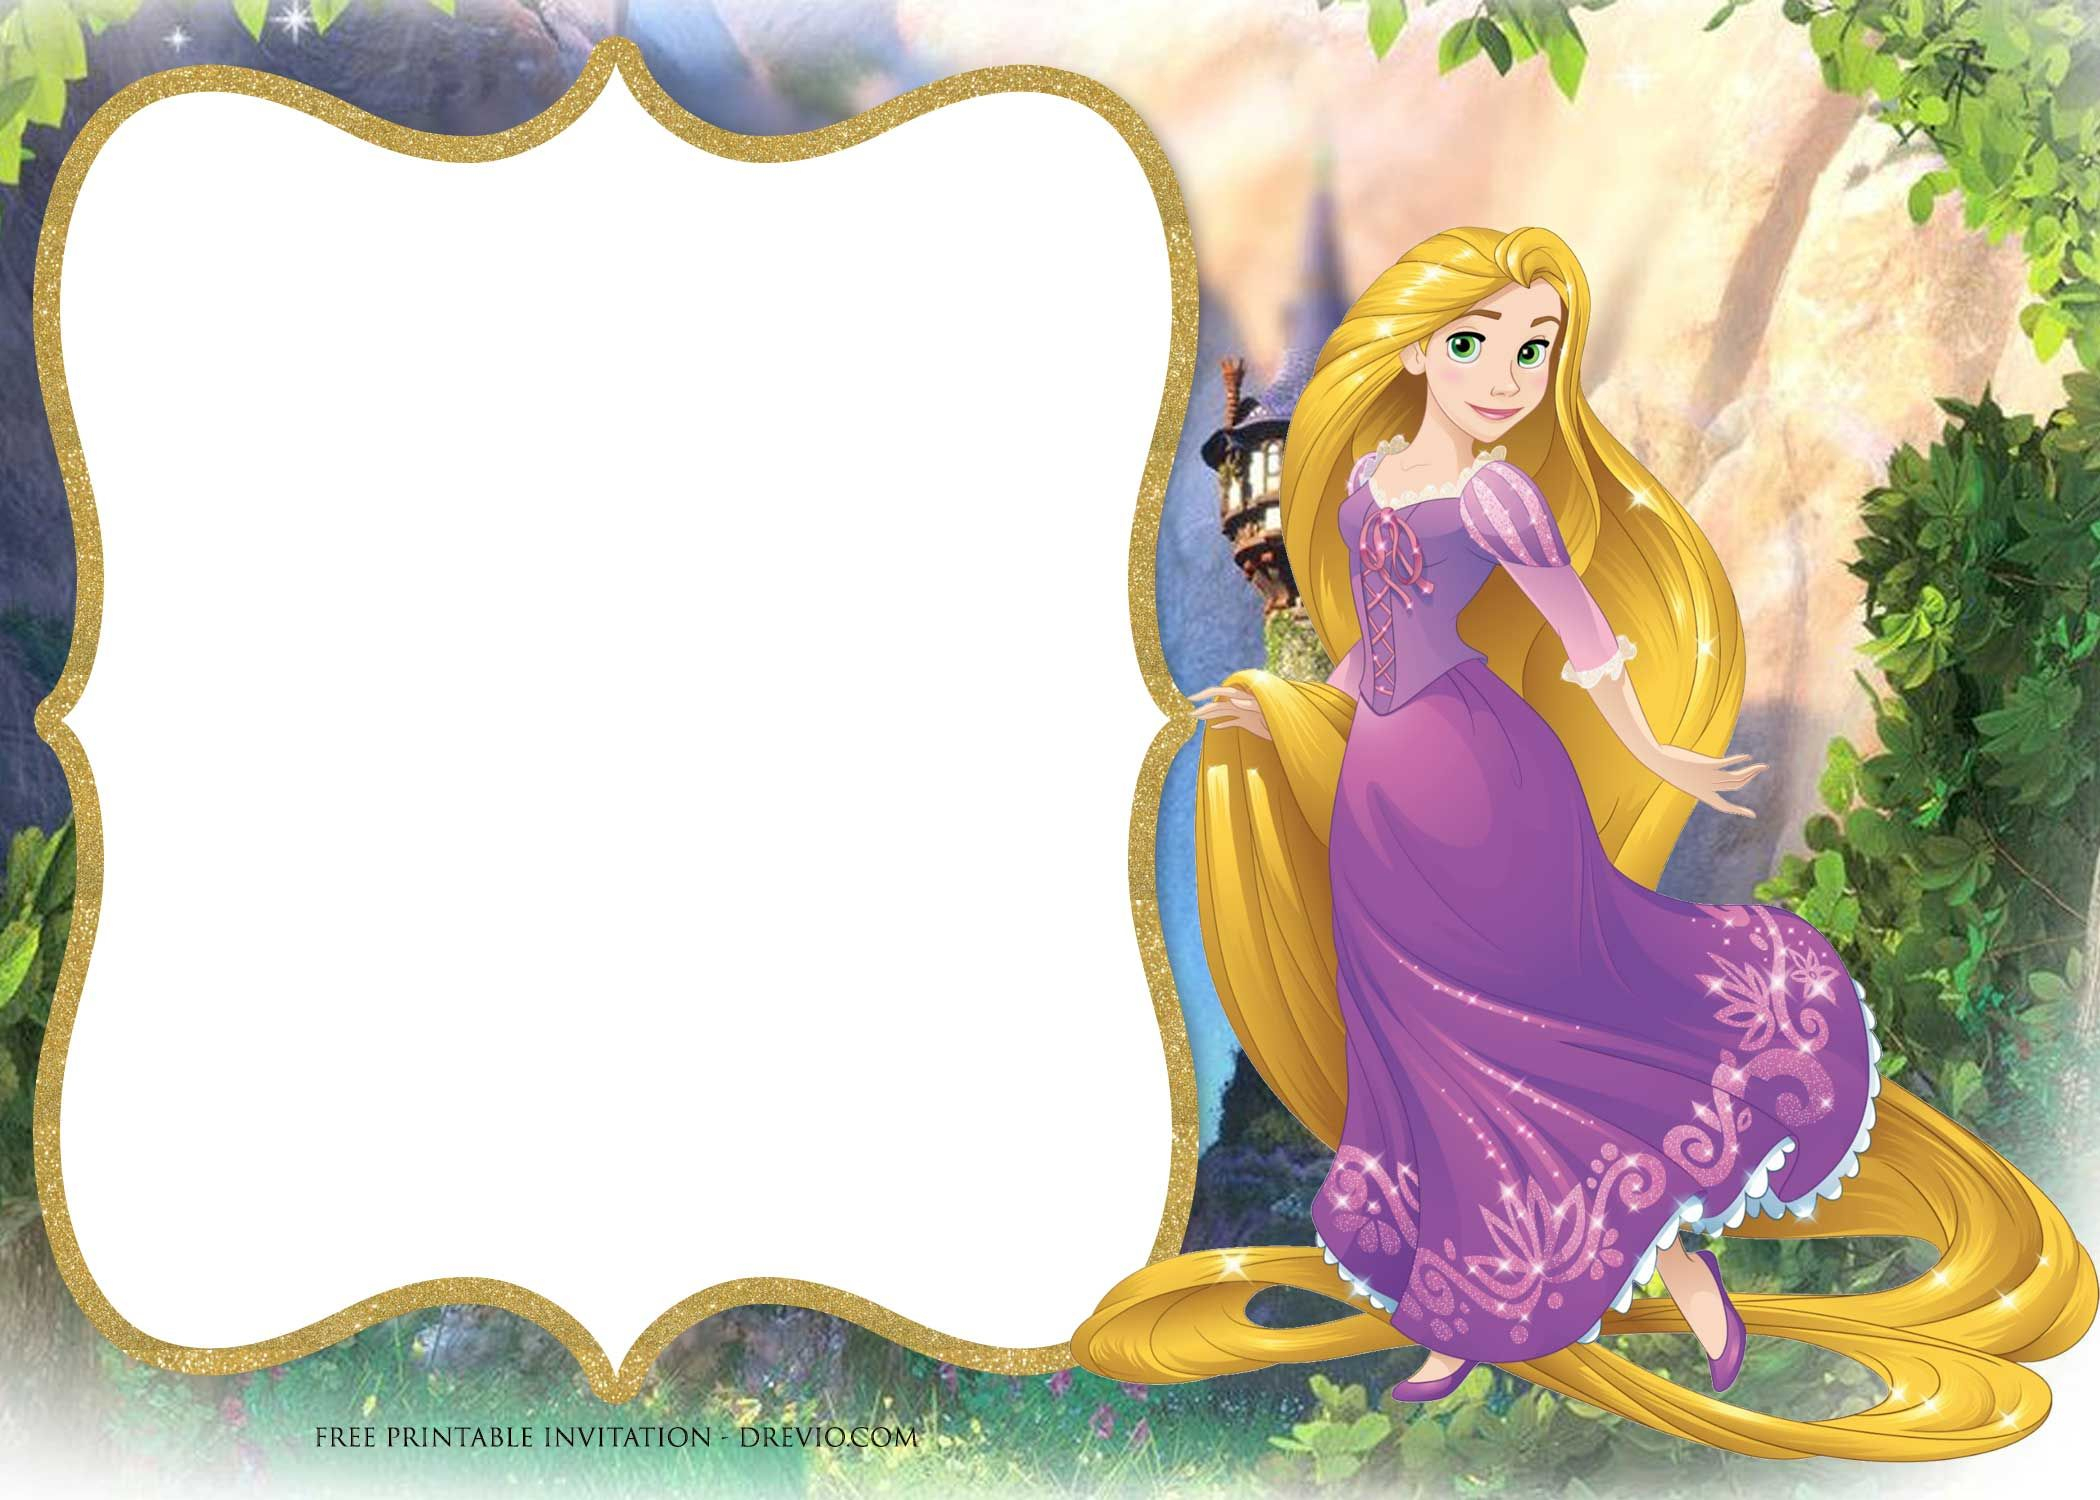 Free Printable Princess Rapunzel Invitation | Free Printable - Free Printable Tangled